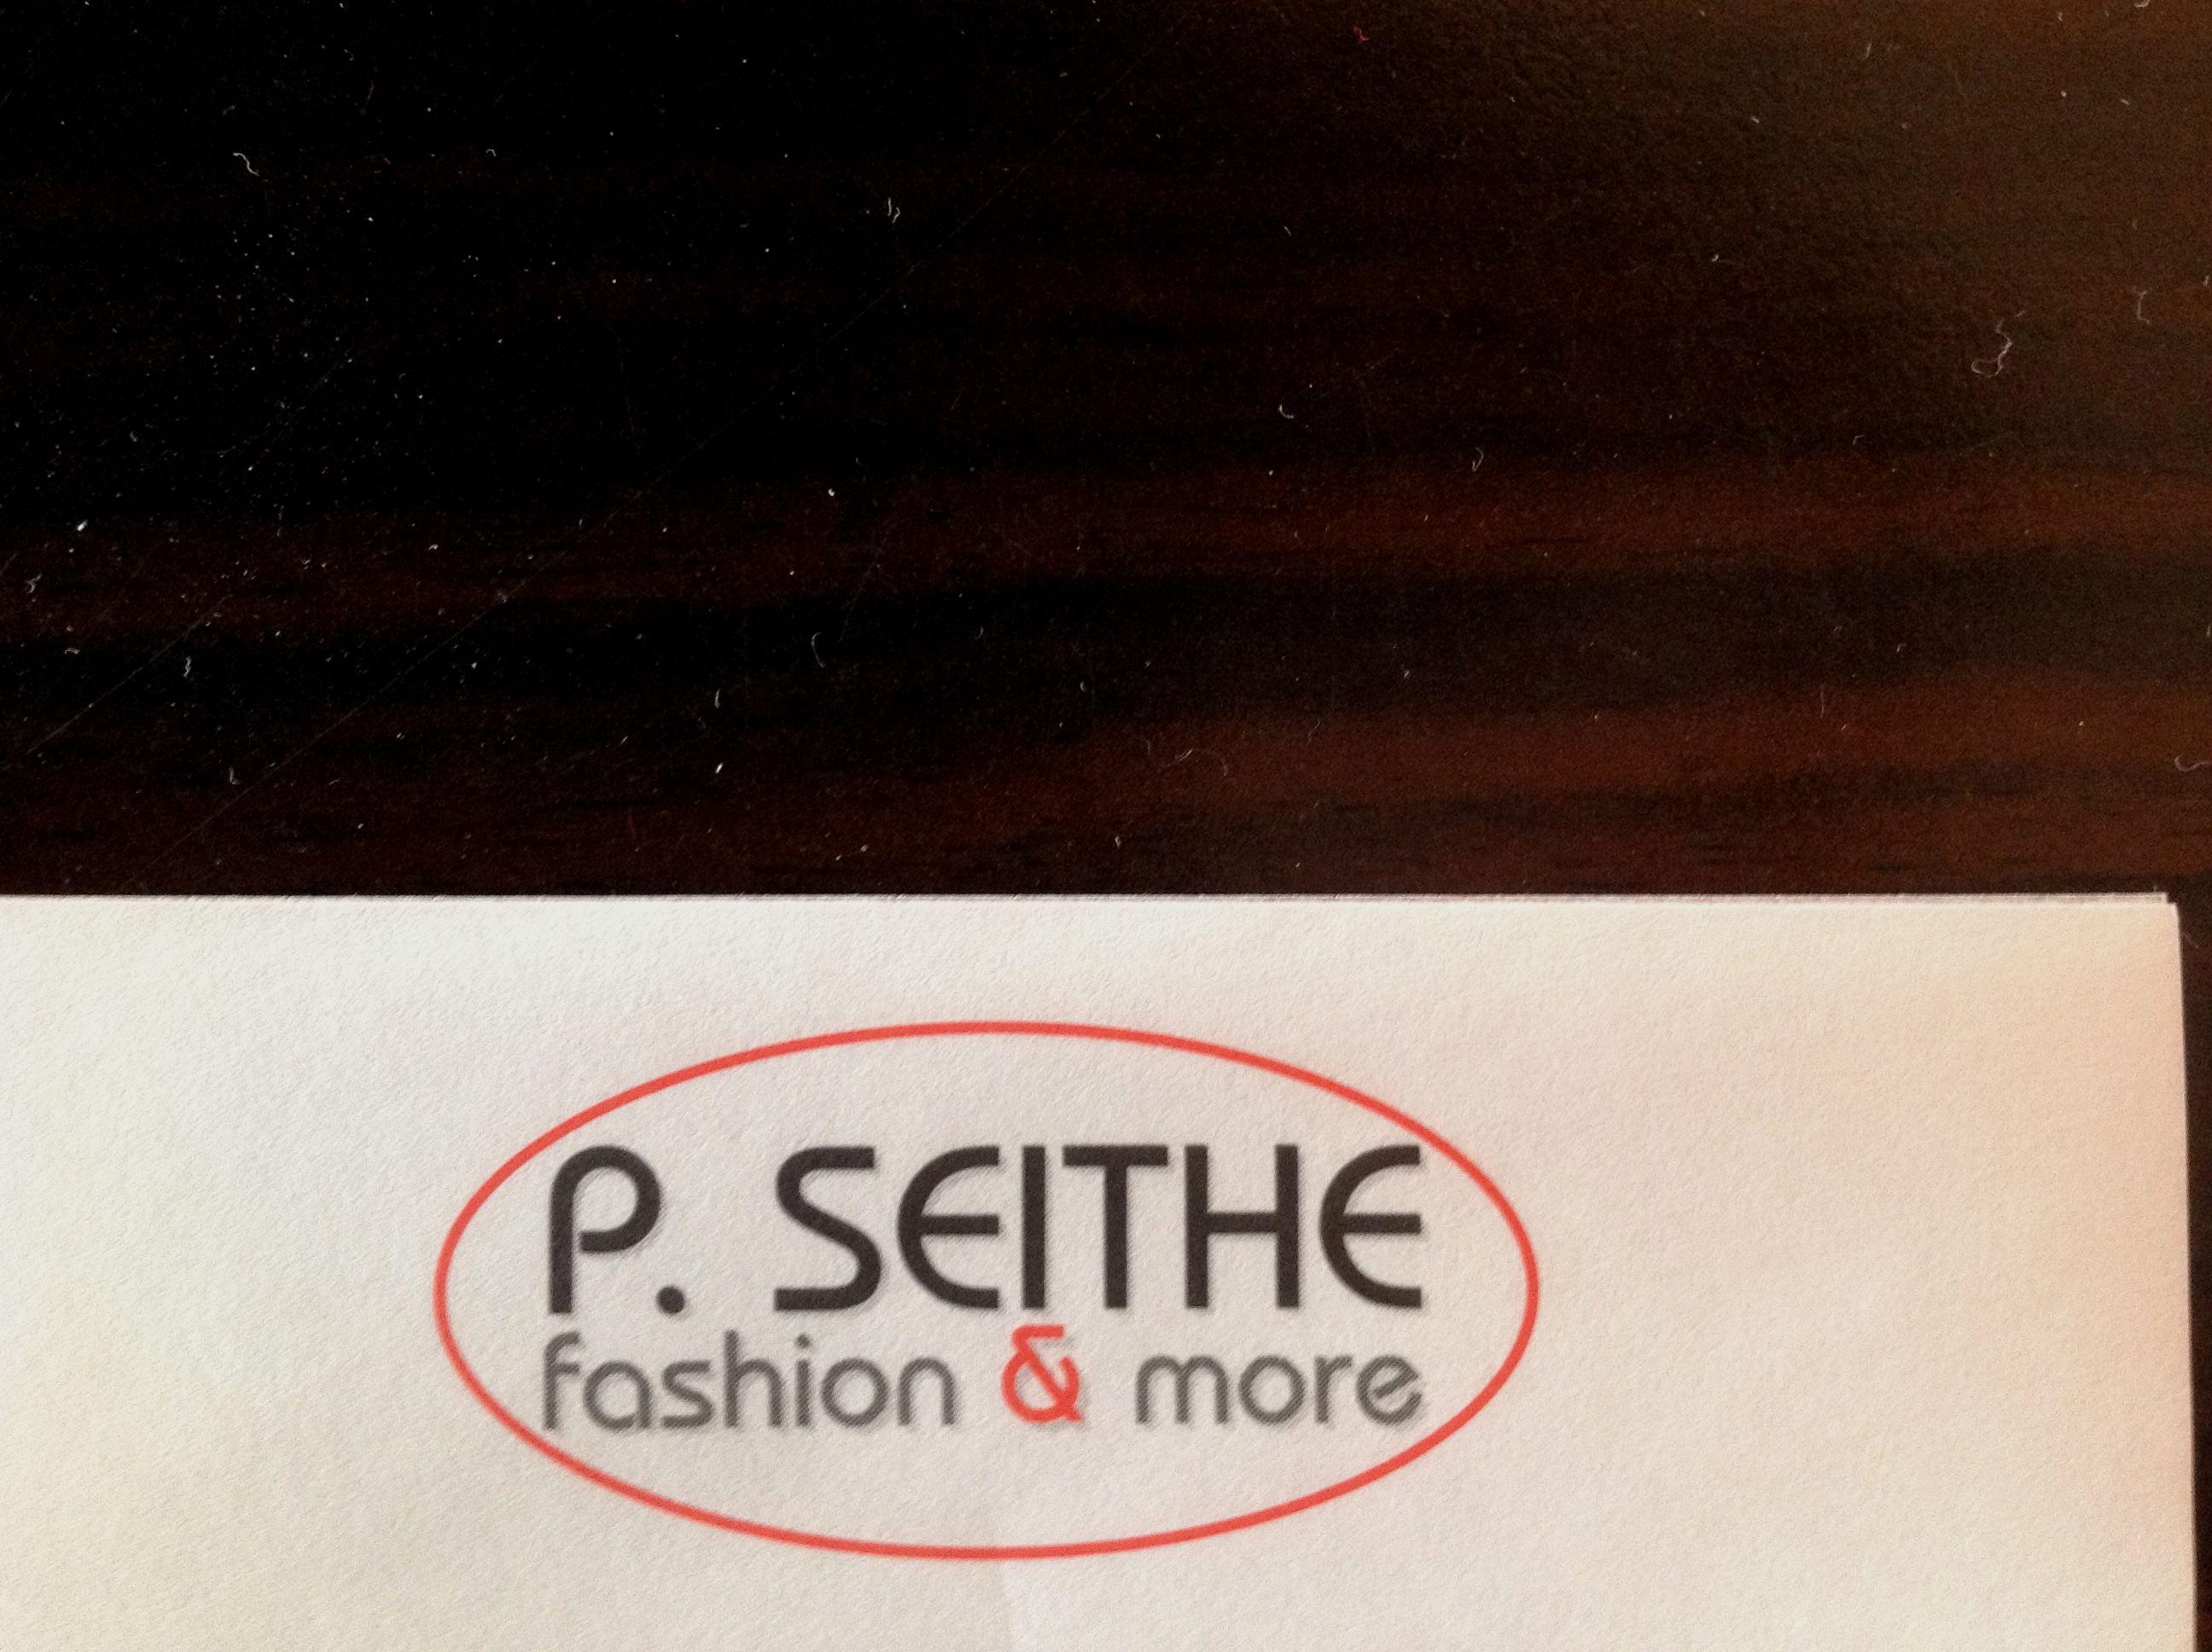 P.SEITHE fashion&more